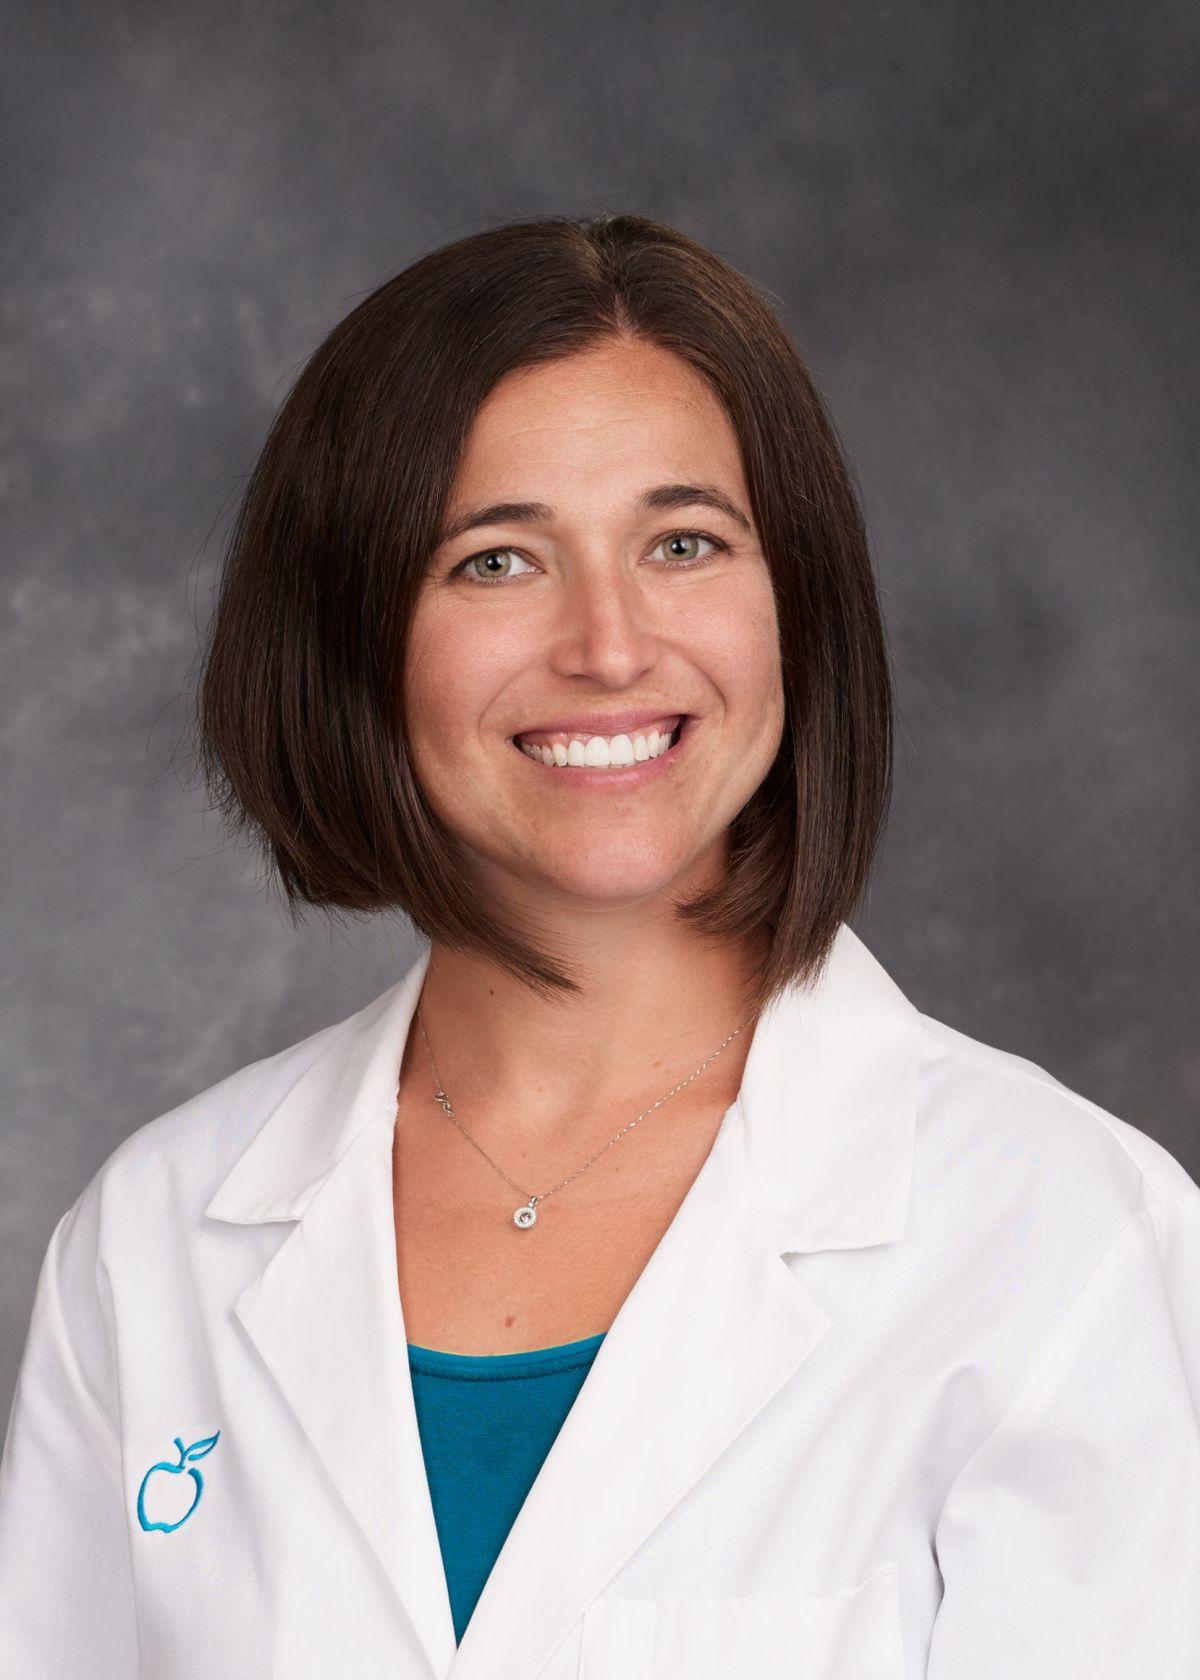 Bluffton Hospital Gains Pediatric Hospitalist